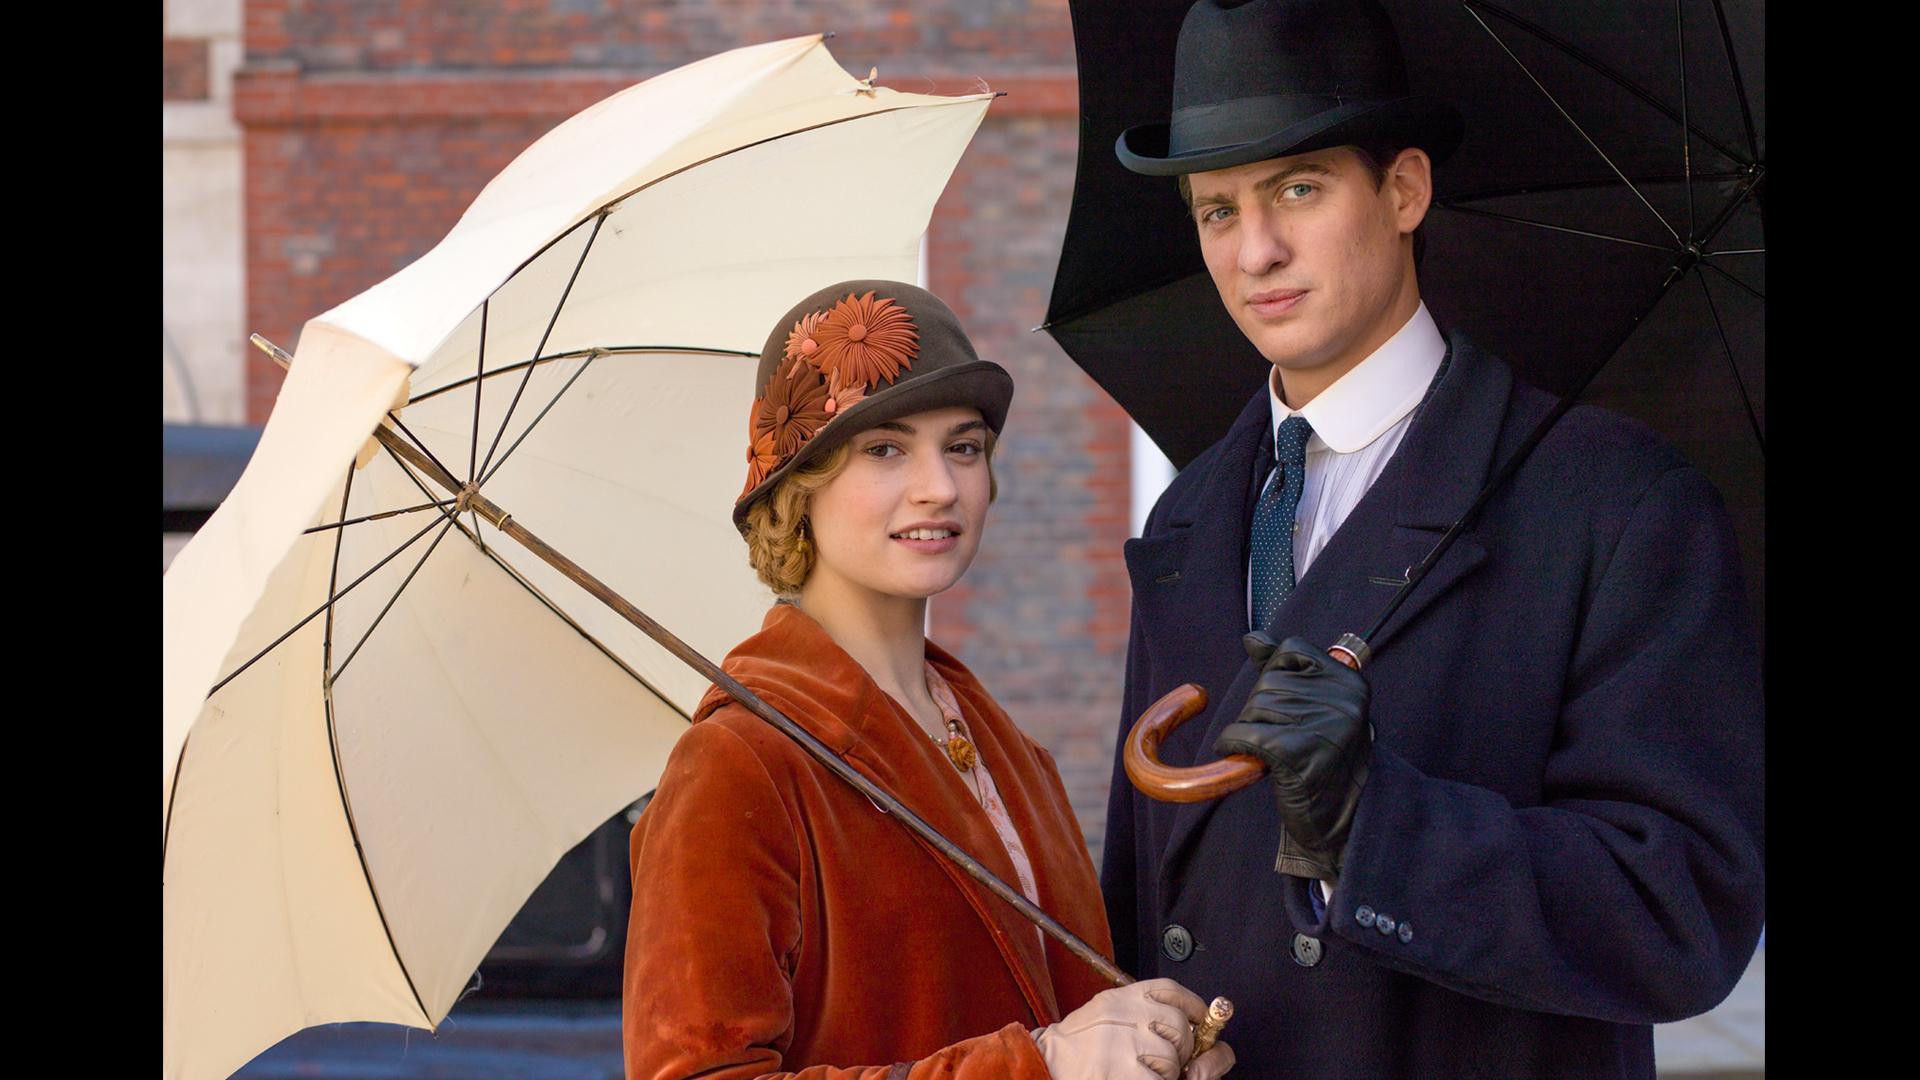 Downton Abbey, Season 5 Episode 7: Love is in the Air | 7. Episode 7 | Season 5 | Downton Abbey ...